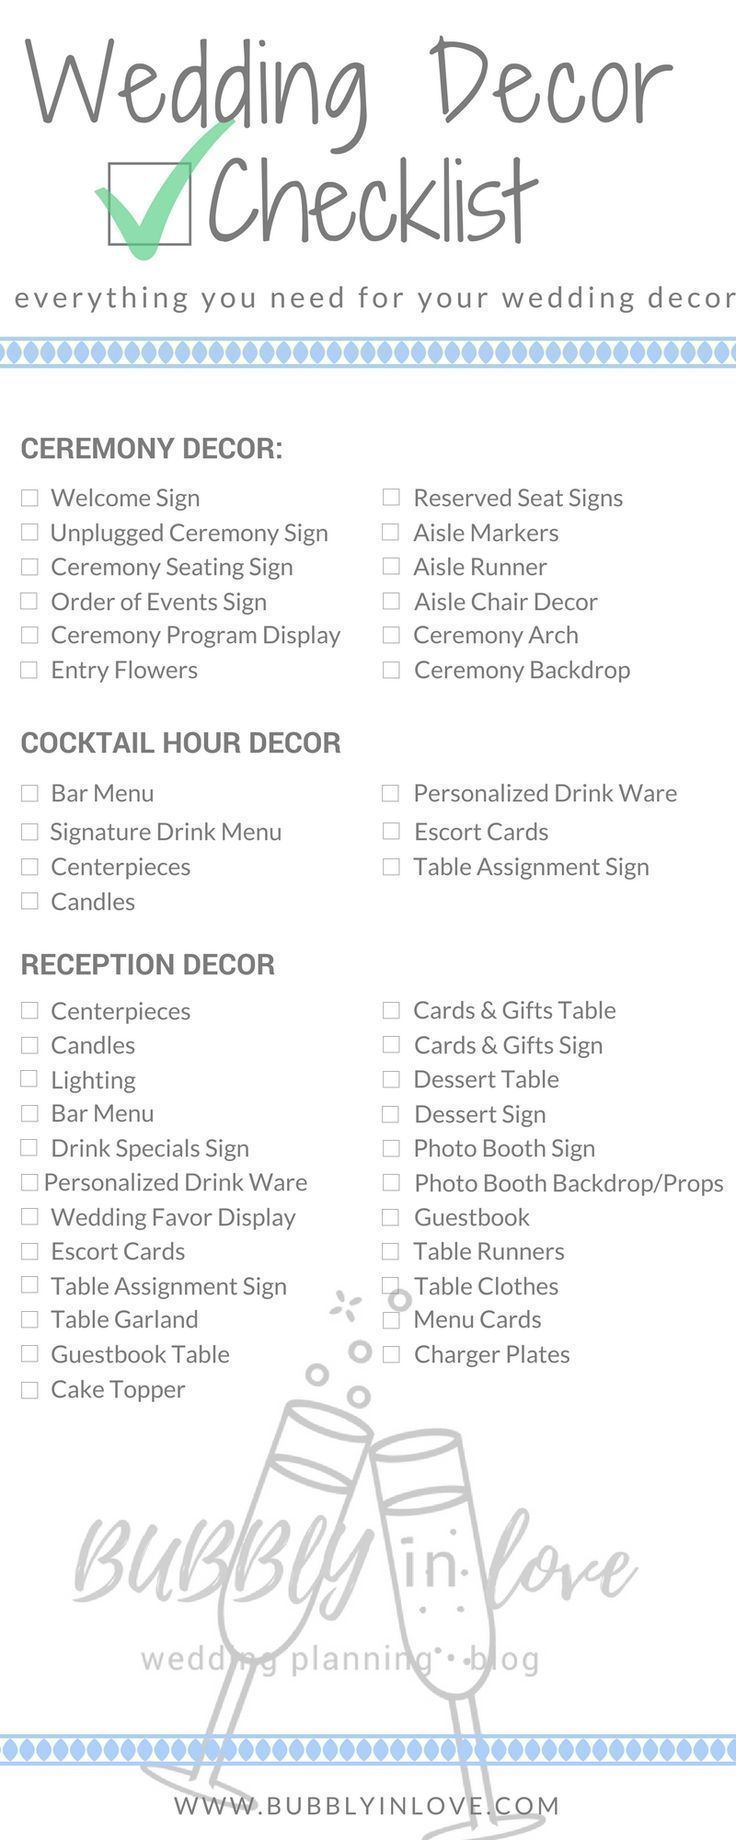 Wedding Decor Checklist | Wedding Decor | Ceremony Decor | Reception ...